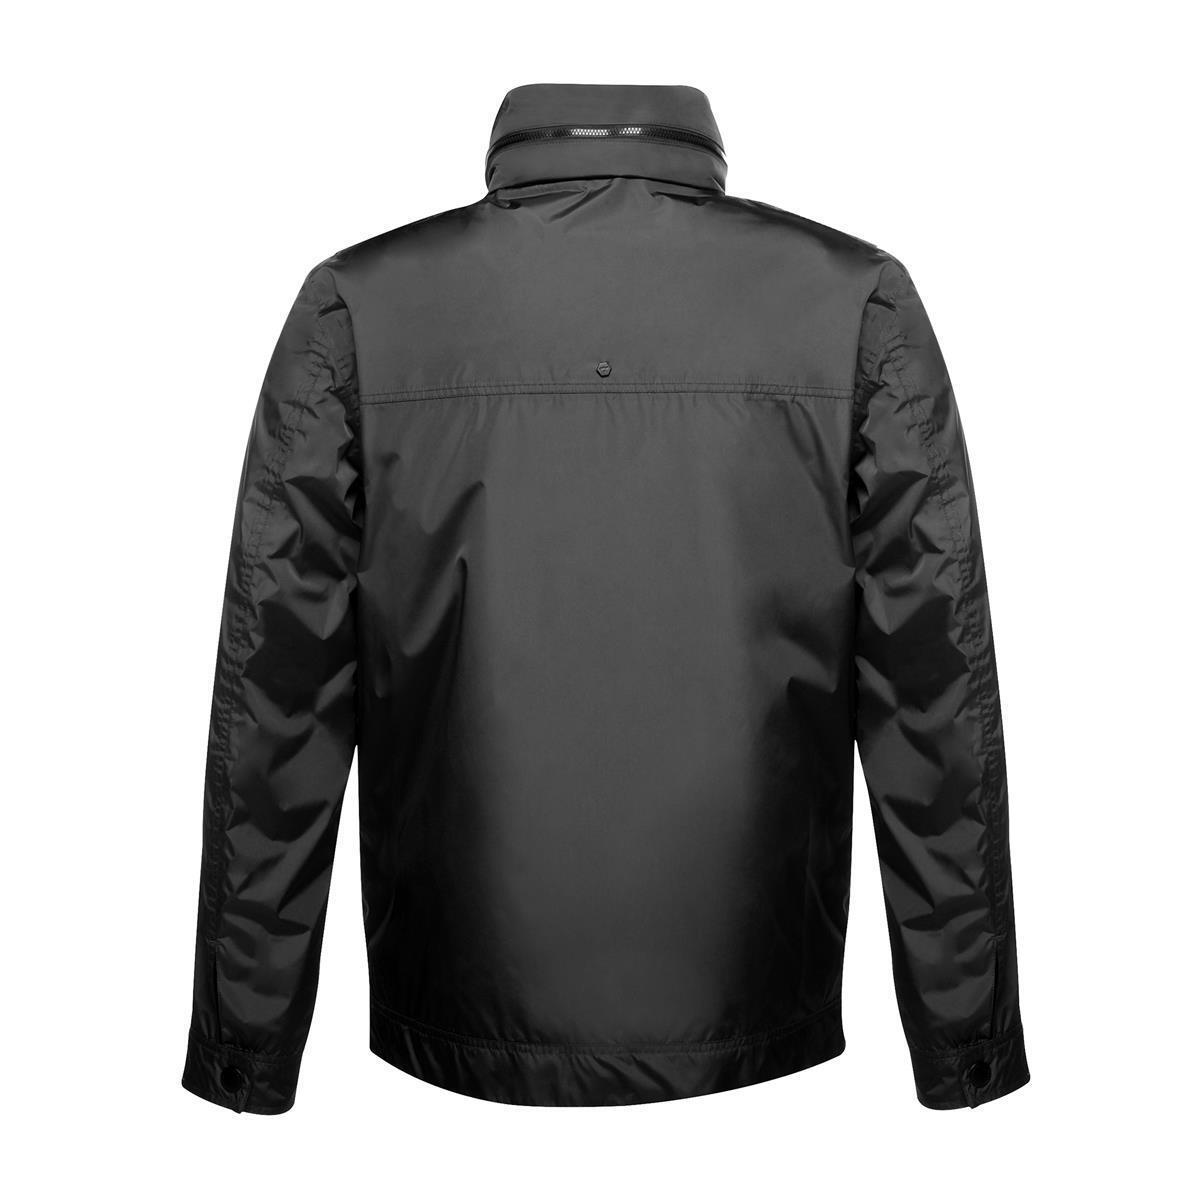 Regatta Deansgate 3 In 1 Mens Waterproof Jacket Navy Removable Bodywarmer Hood